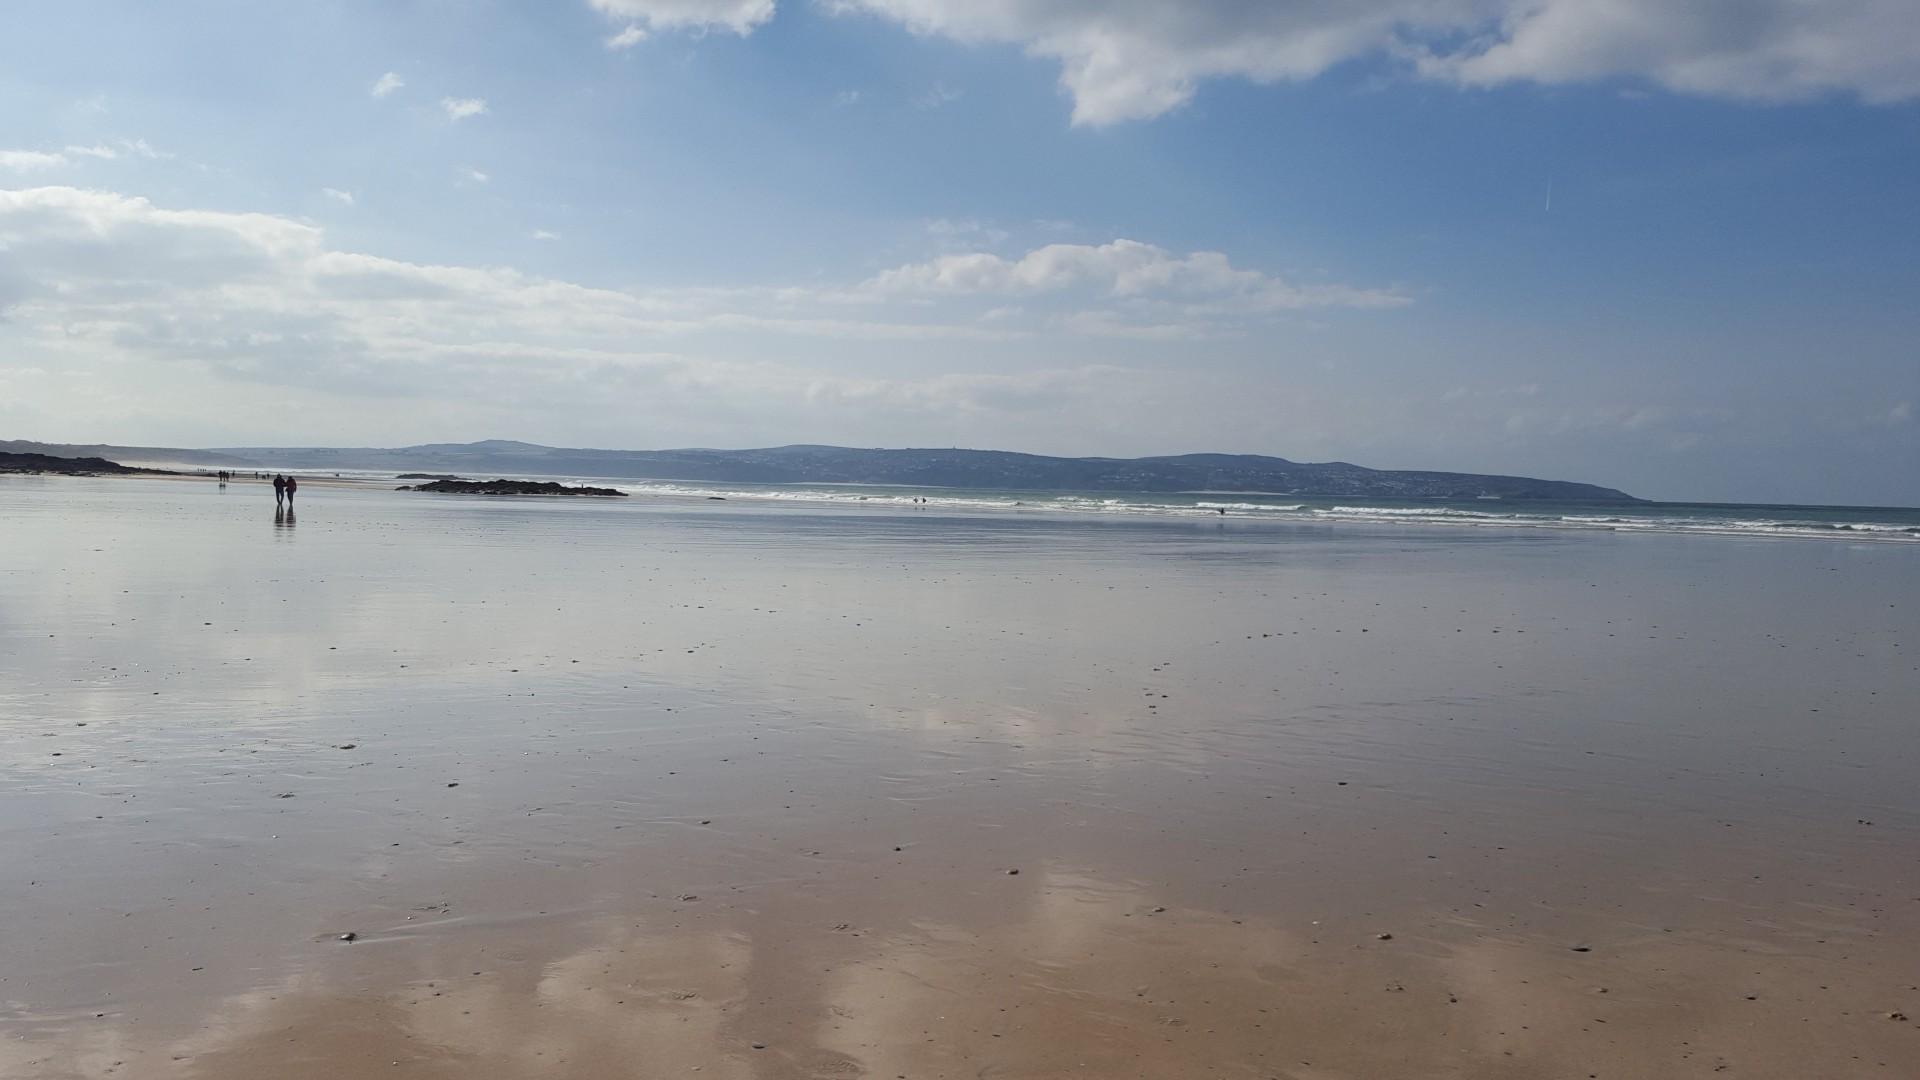 Reflection Beach Landscape Low Tide 1920x1080